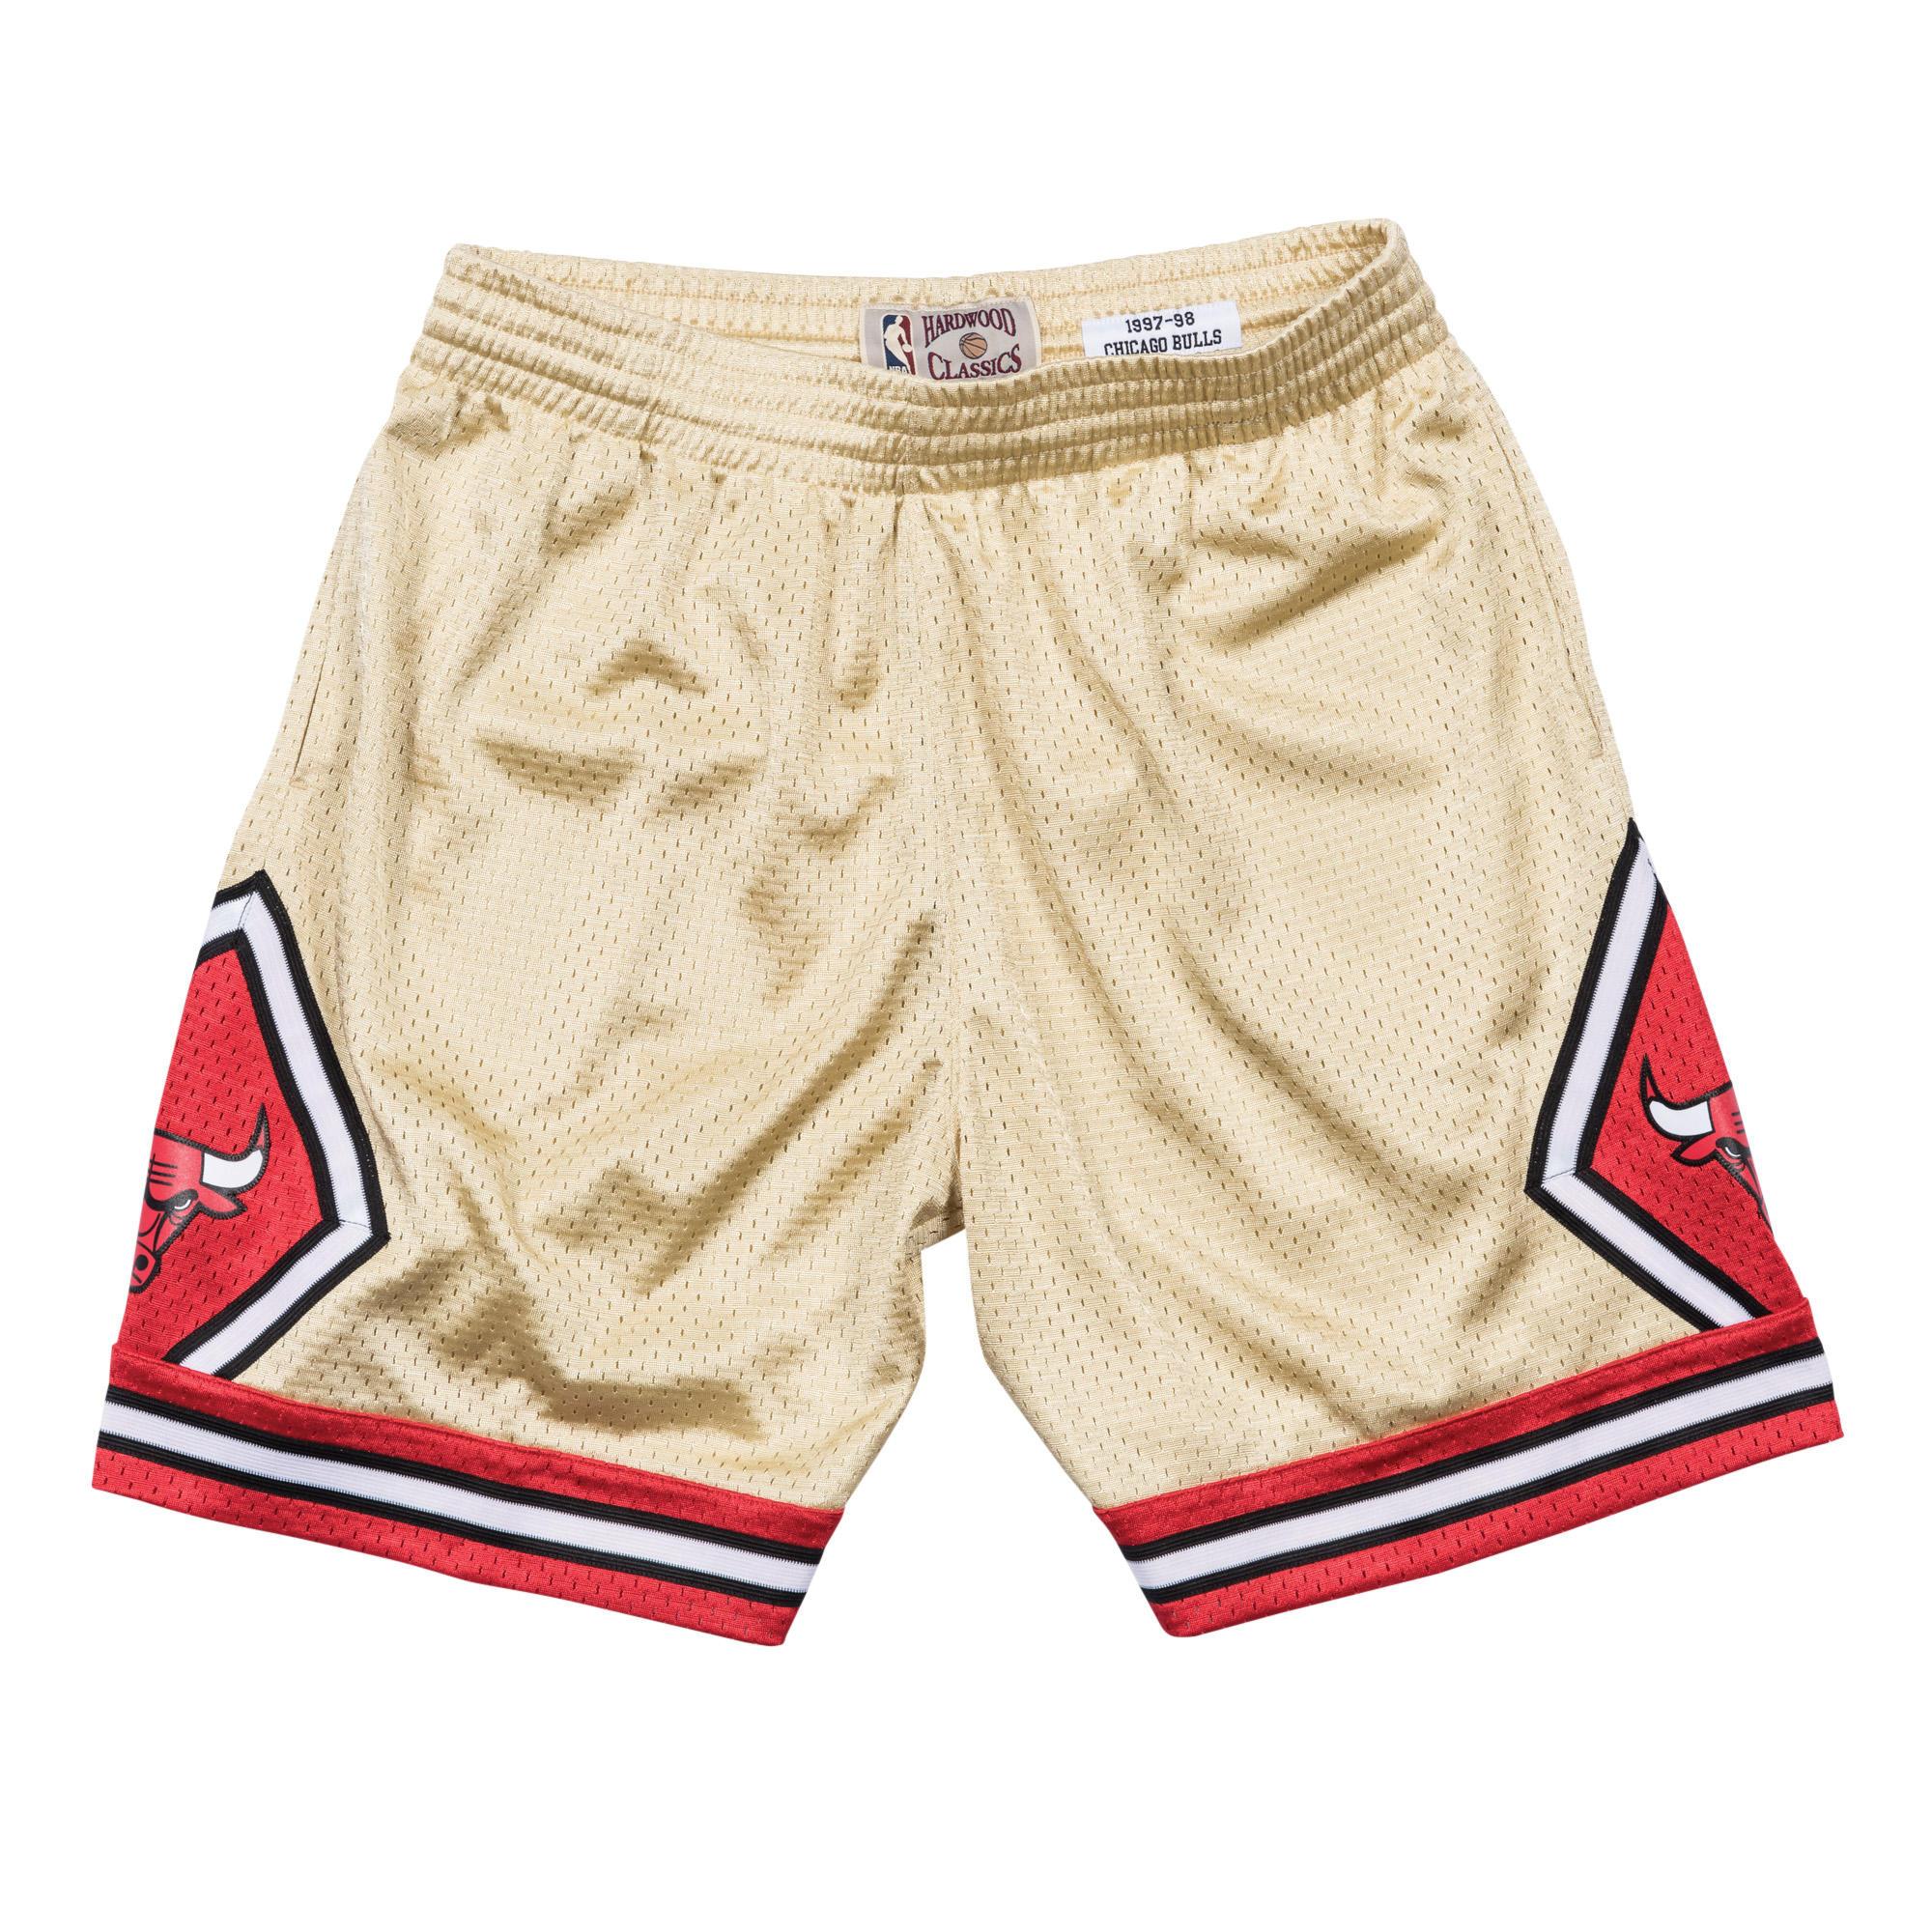 11163620a6d96f Gold Swingman Shorts Chicago Bulls